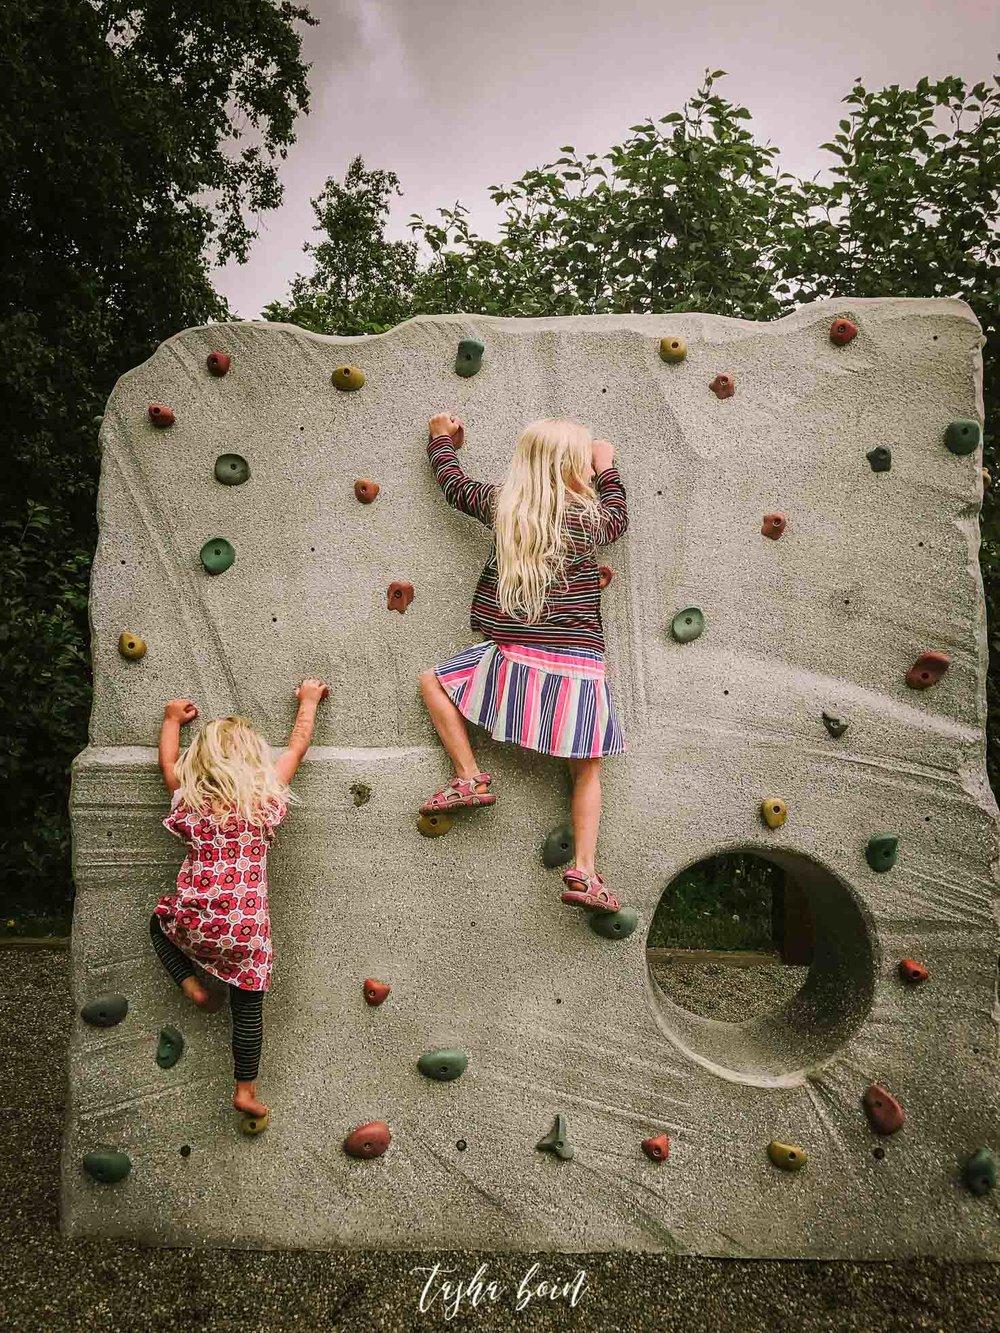 Day 22: Rock climbing